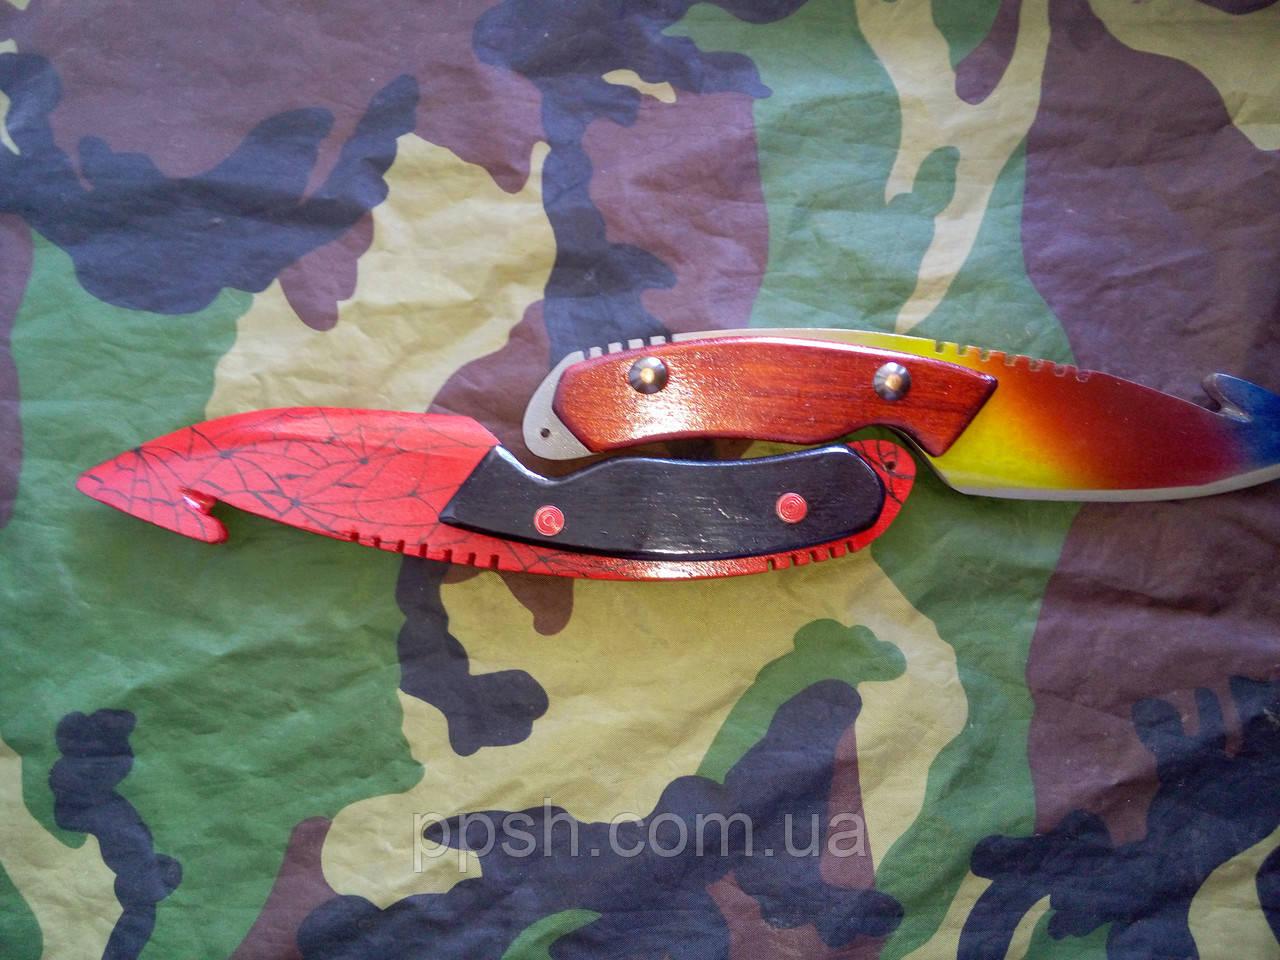 Нож GuT:KniFe